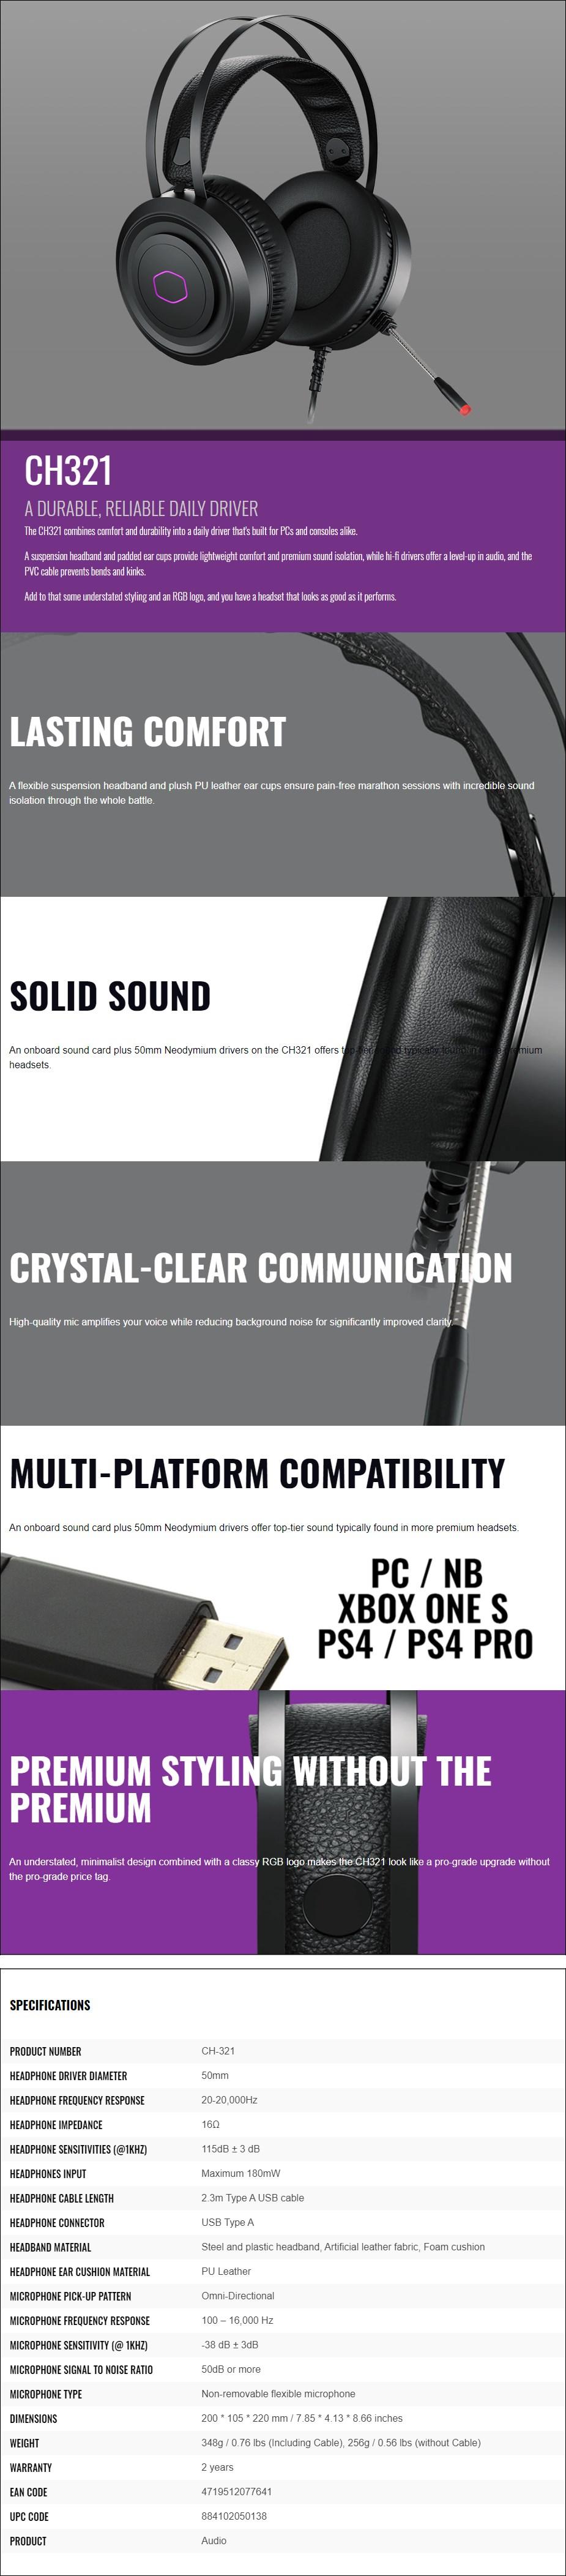 cooler-master-ch321-rgb-gaming-headset-ac27702-5.jpg